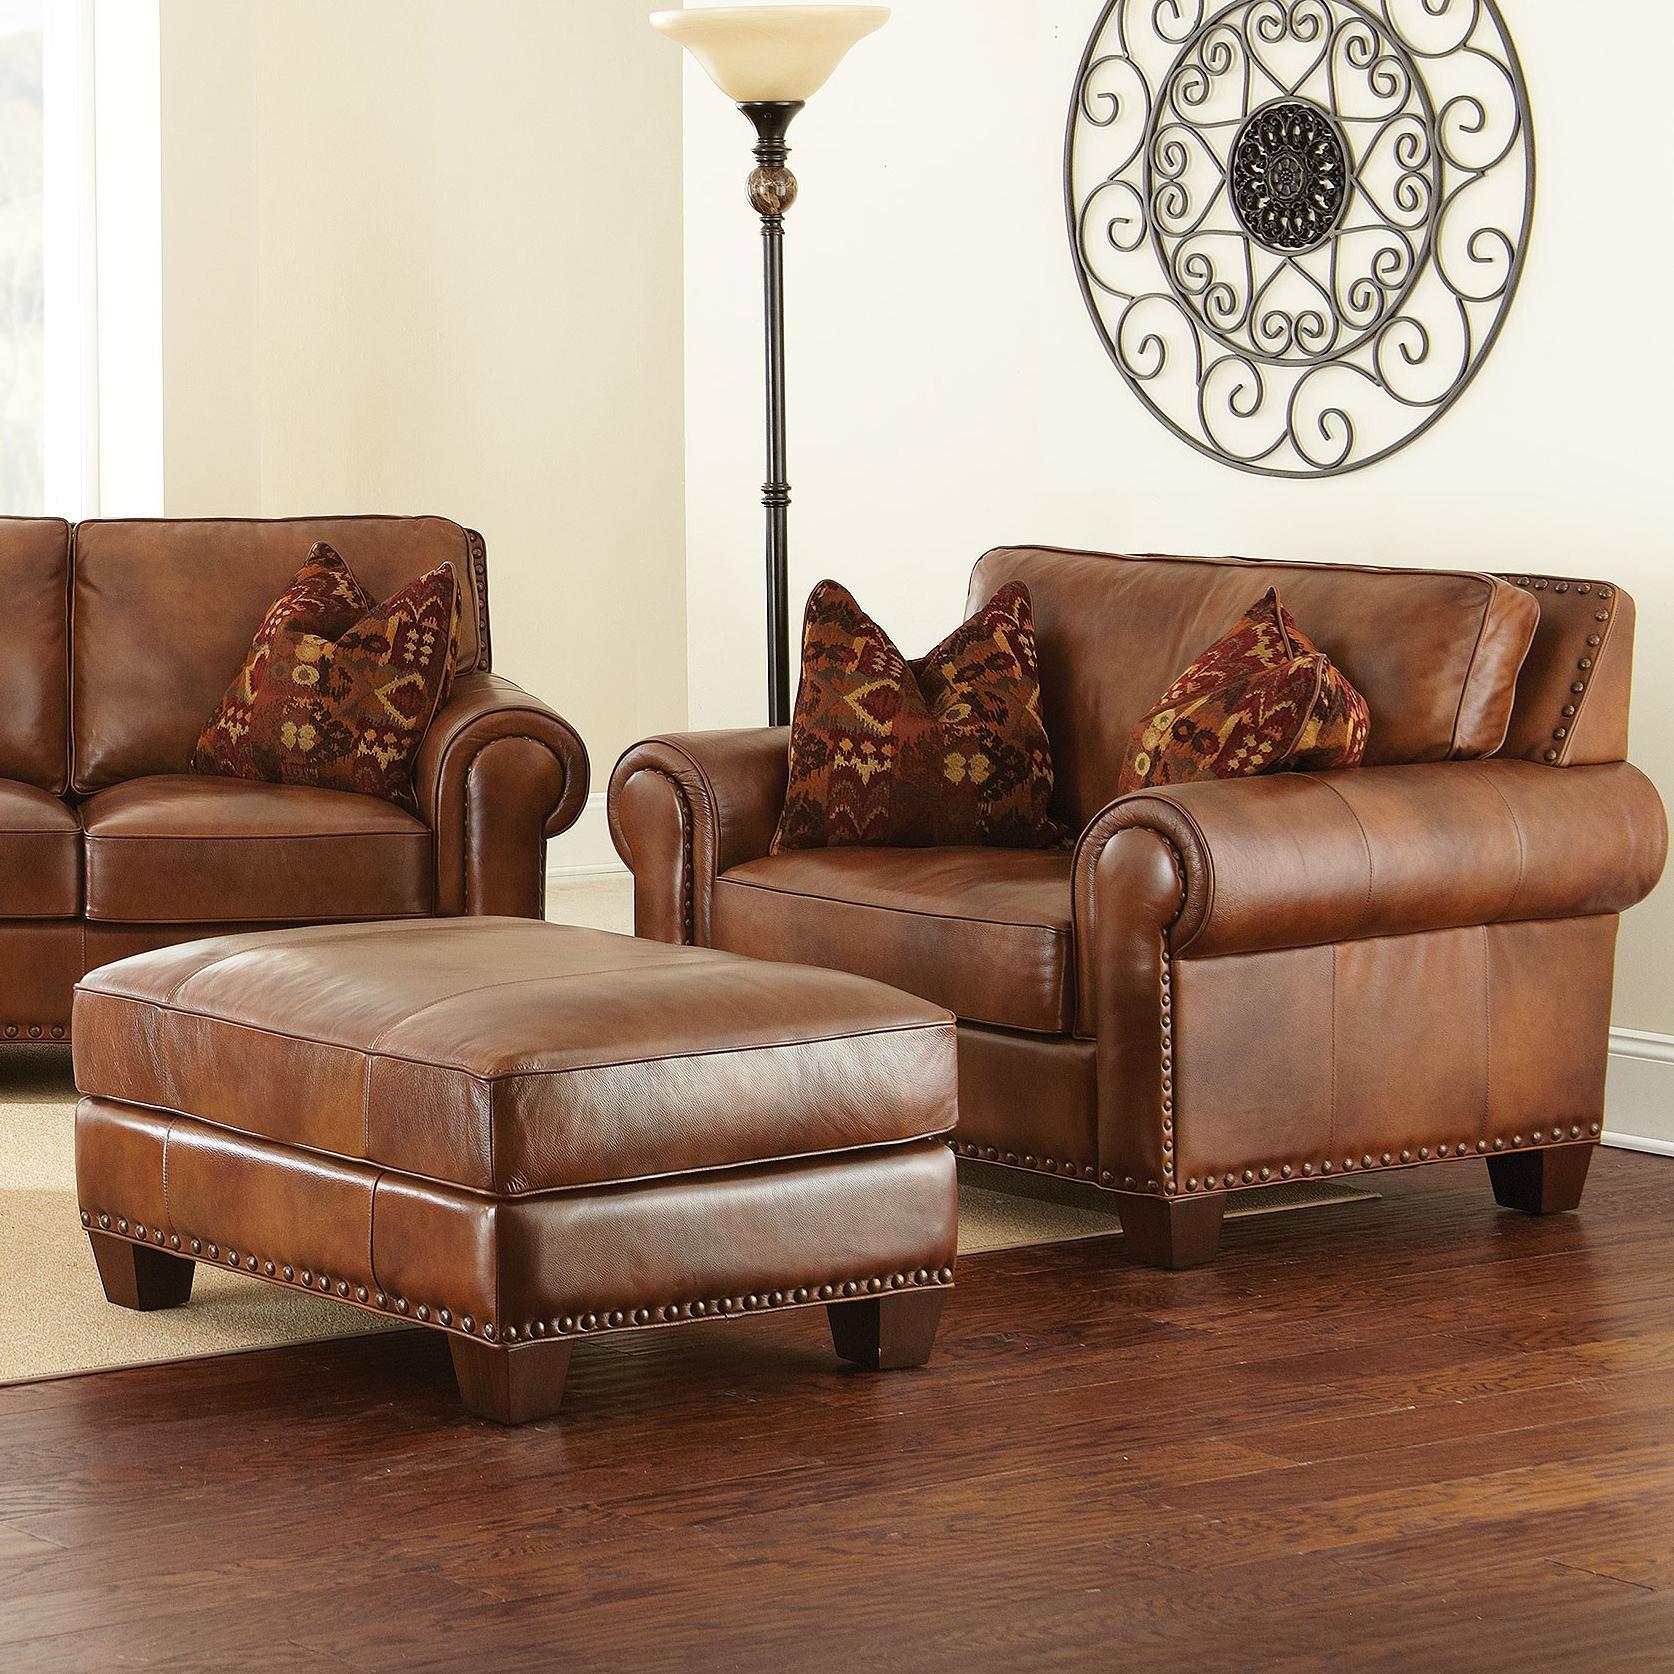 Vendor 3985 Silverado Chair and a Half with Ottoman and